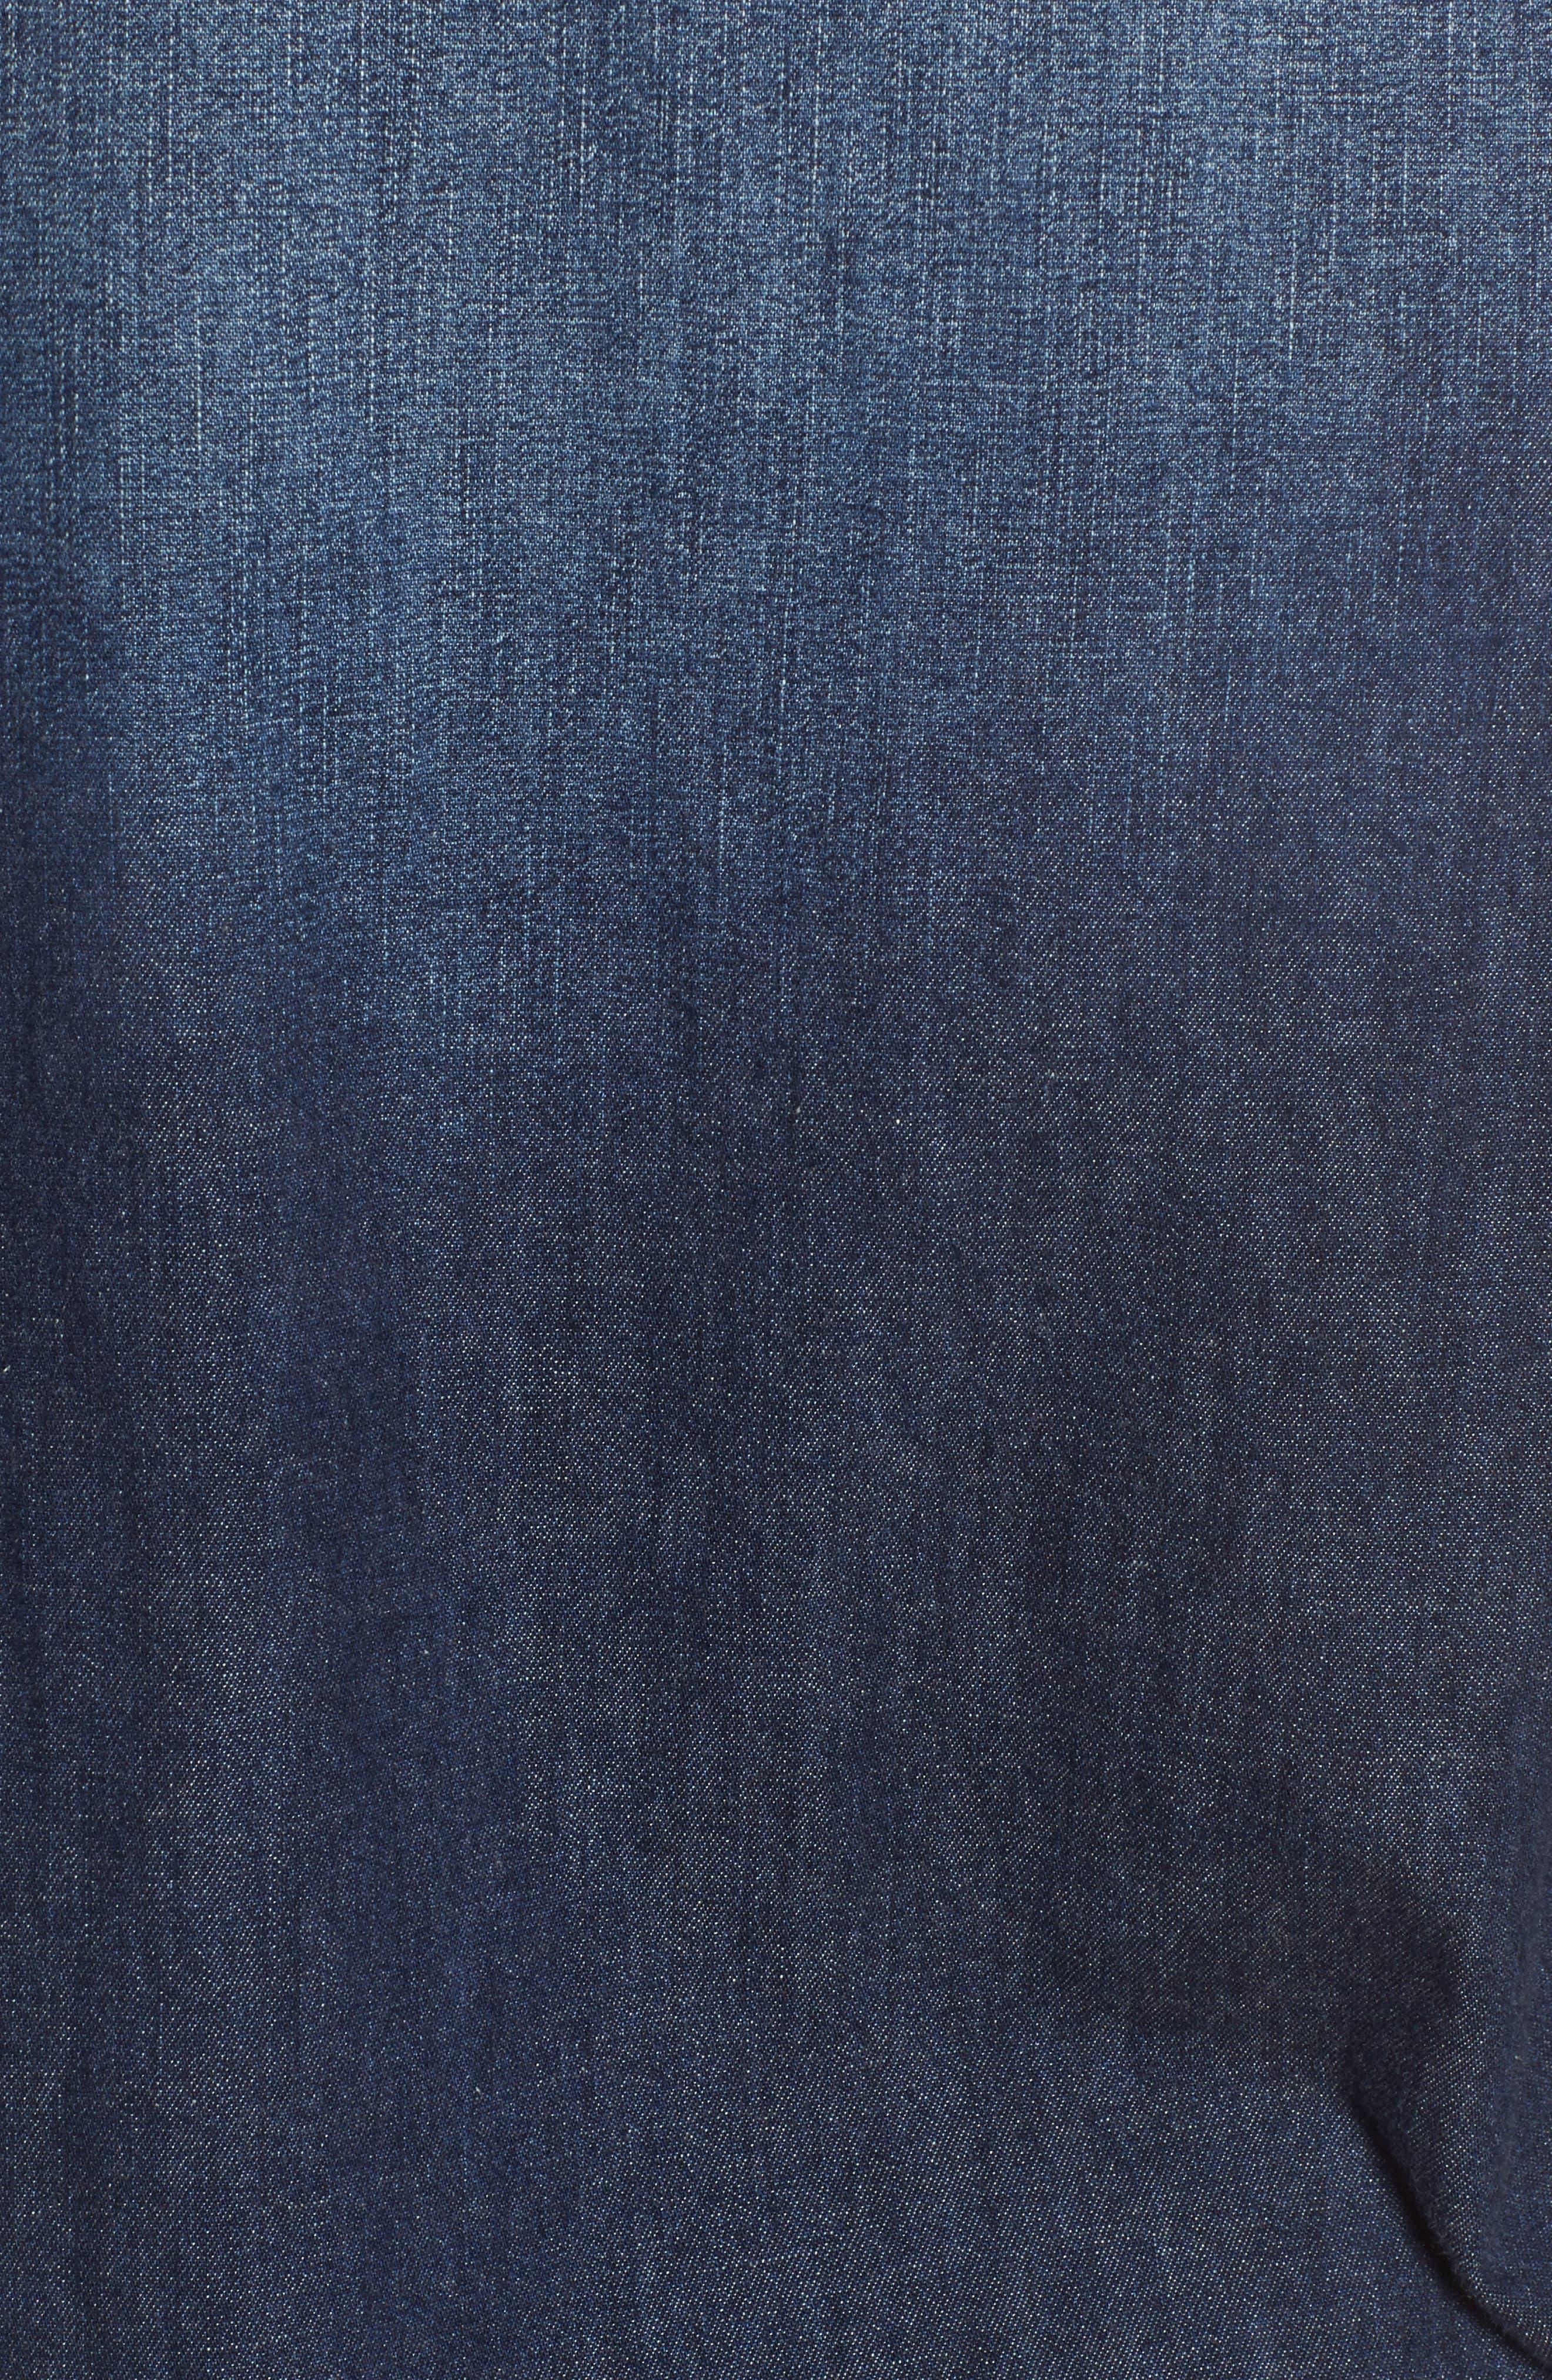 Deanna Denim Shirt,                             Alternate thumbnail 6, color,                             TIMELESS